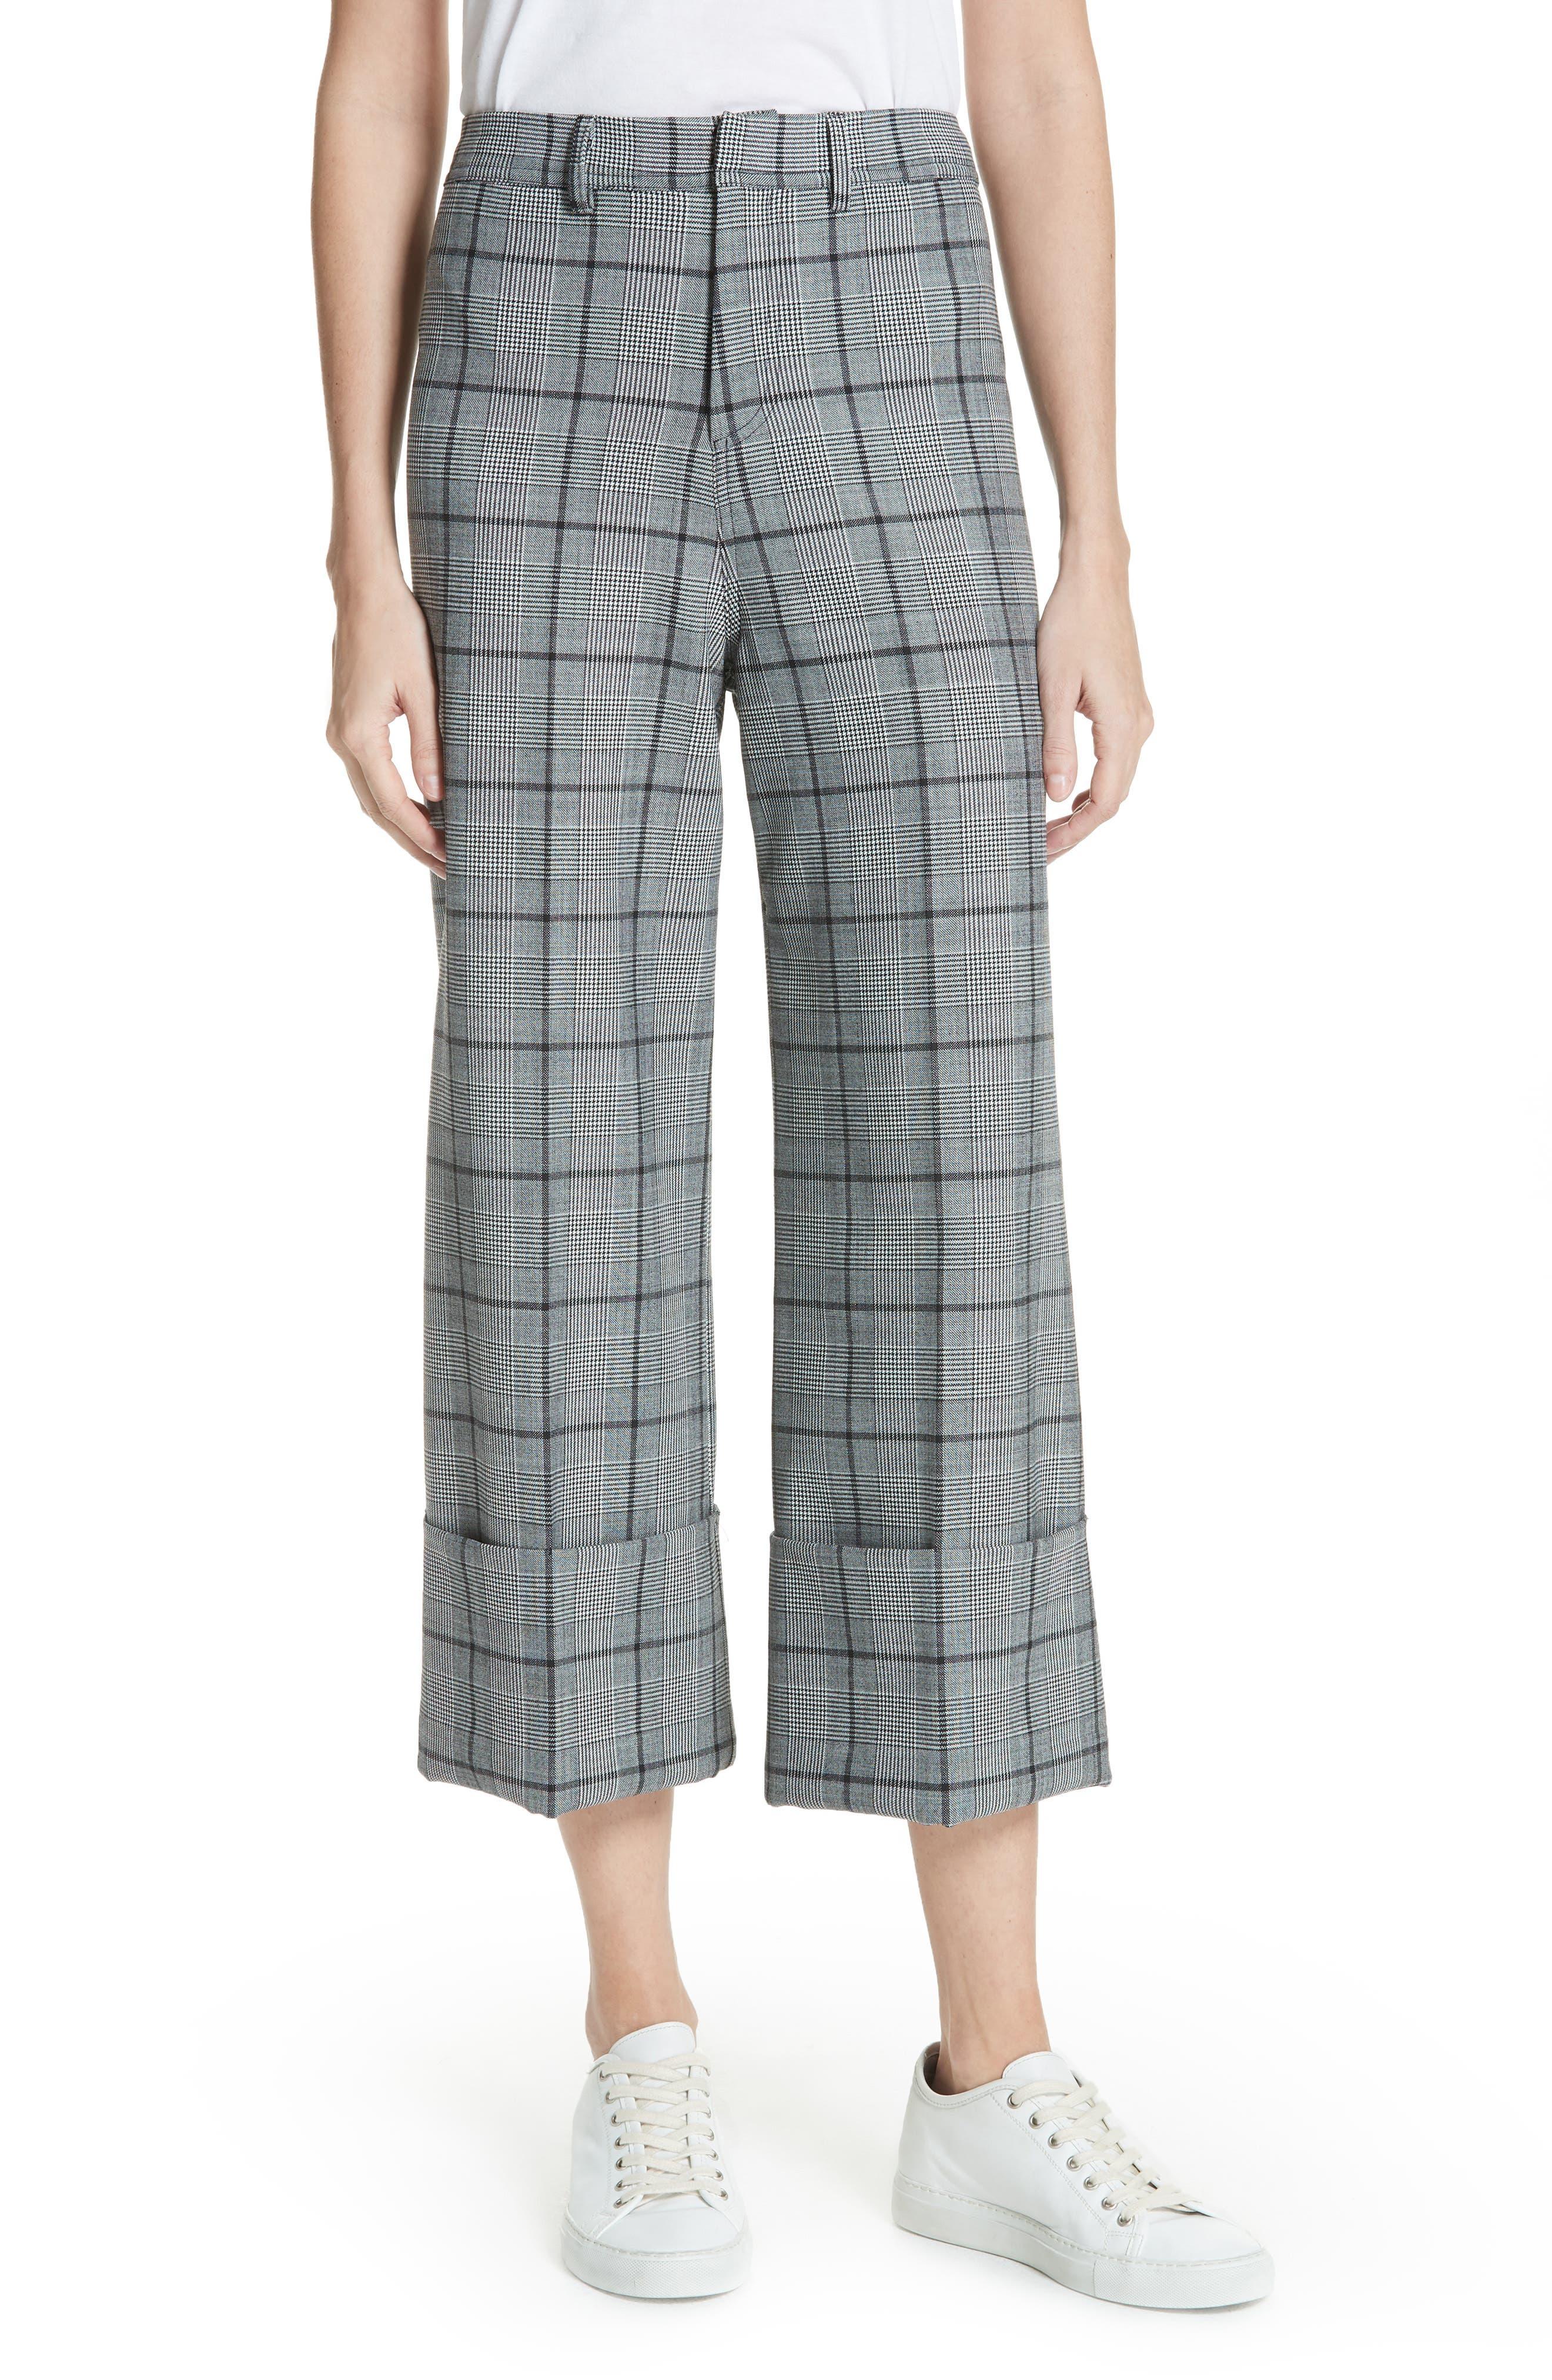 Bacall Cuff Crop Wide Leg Pants,                             Main thumbnail 1, color,                             028